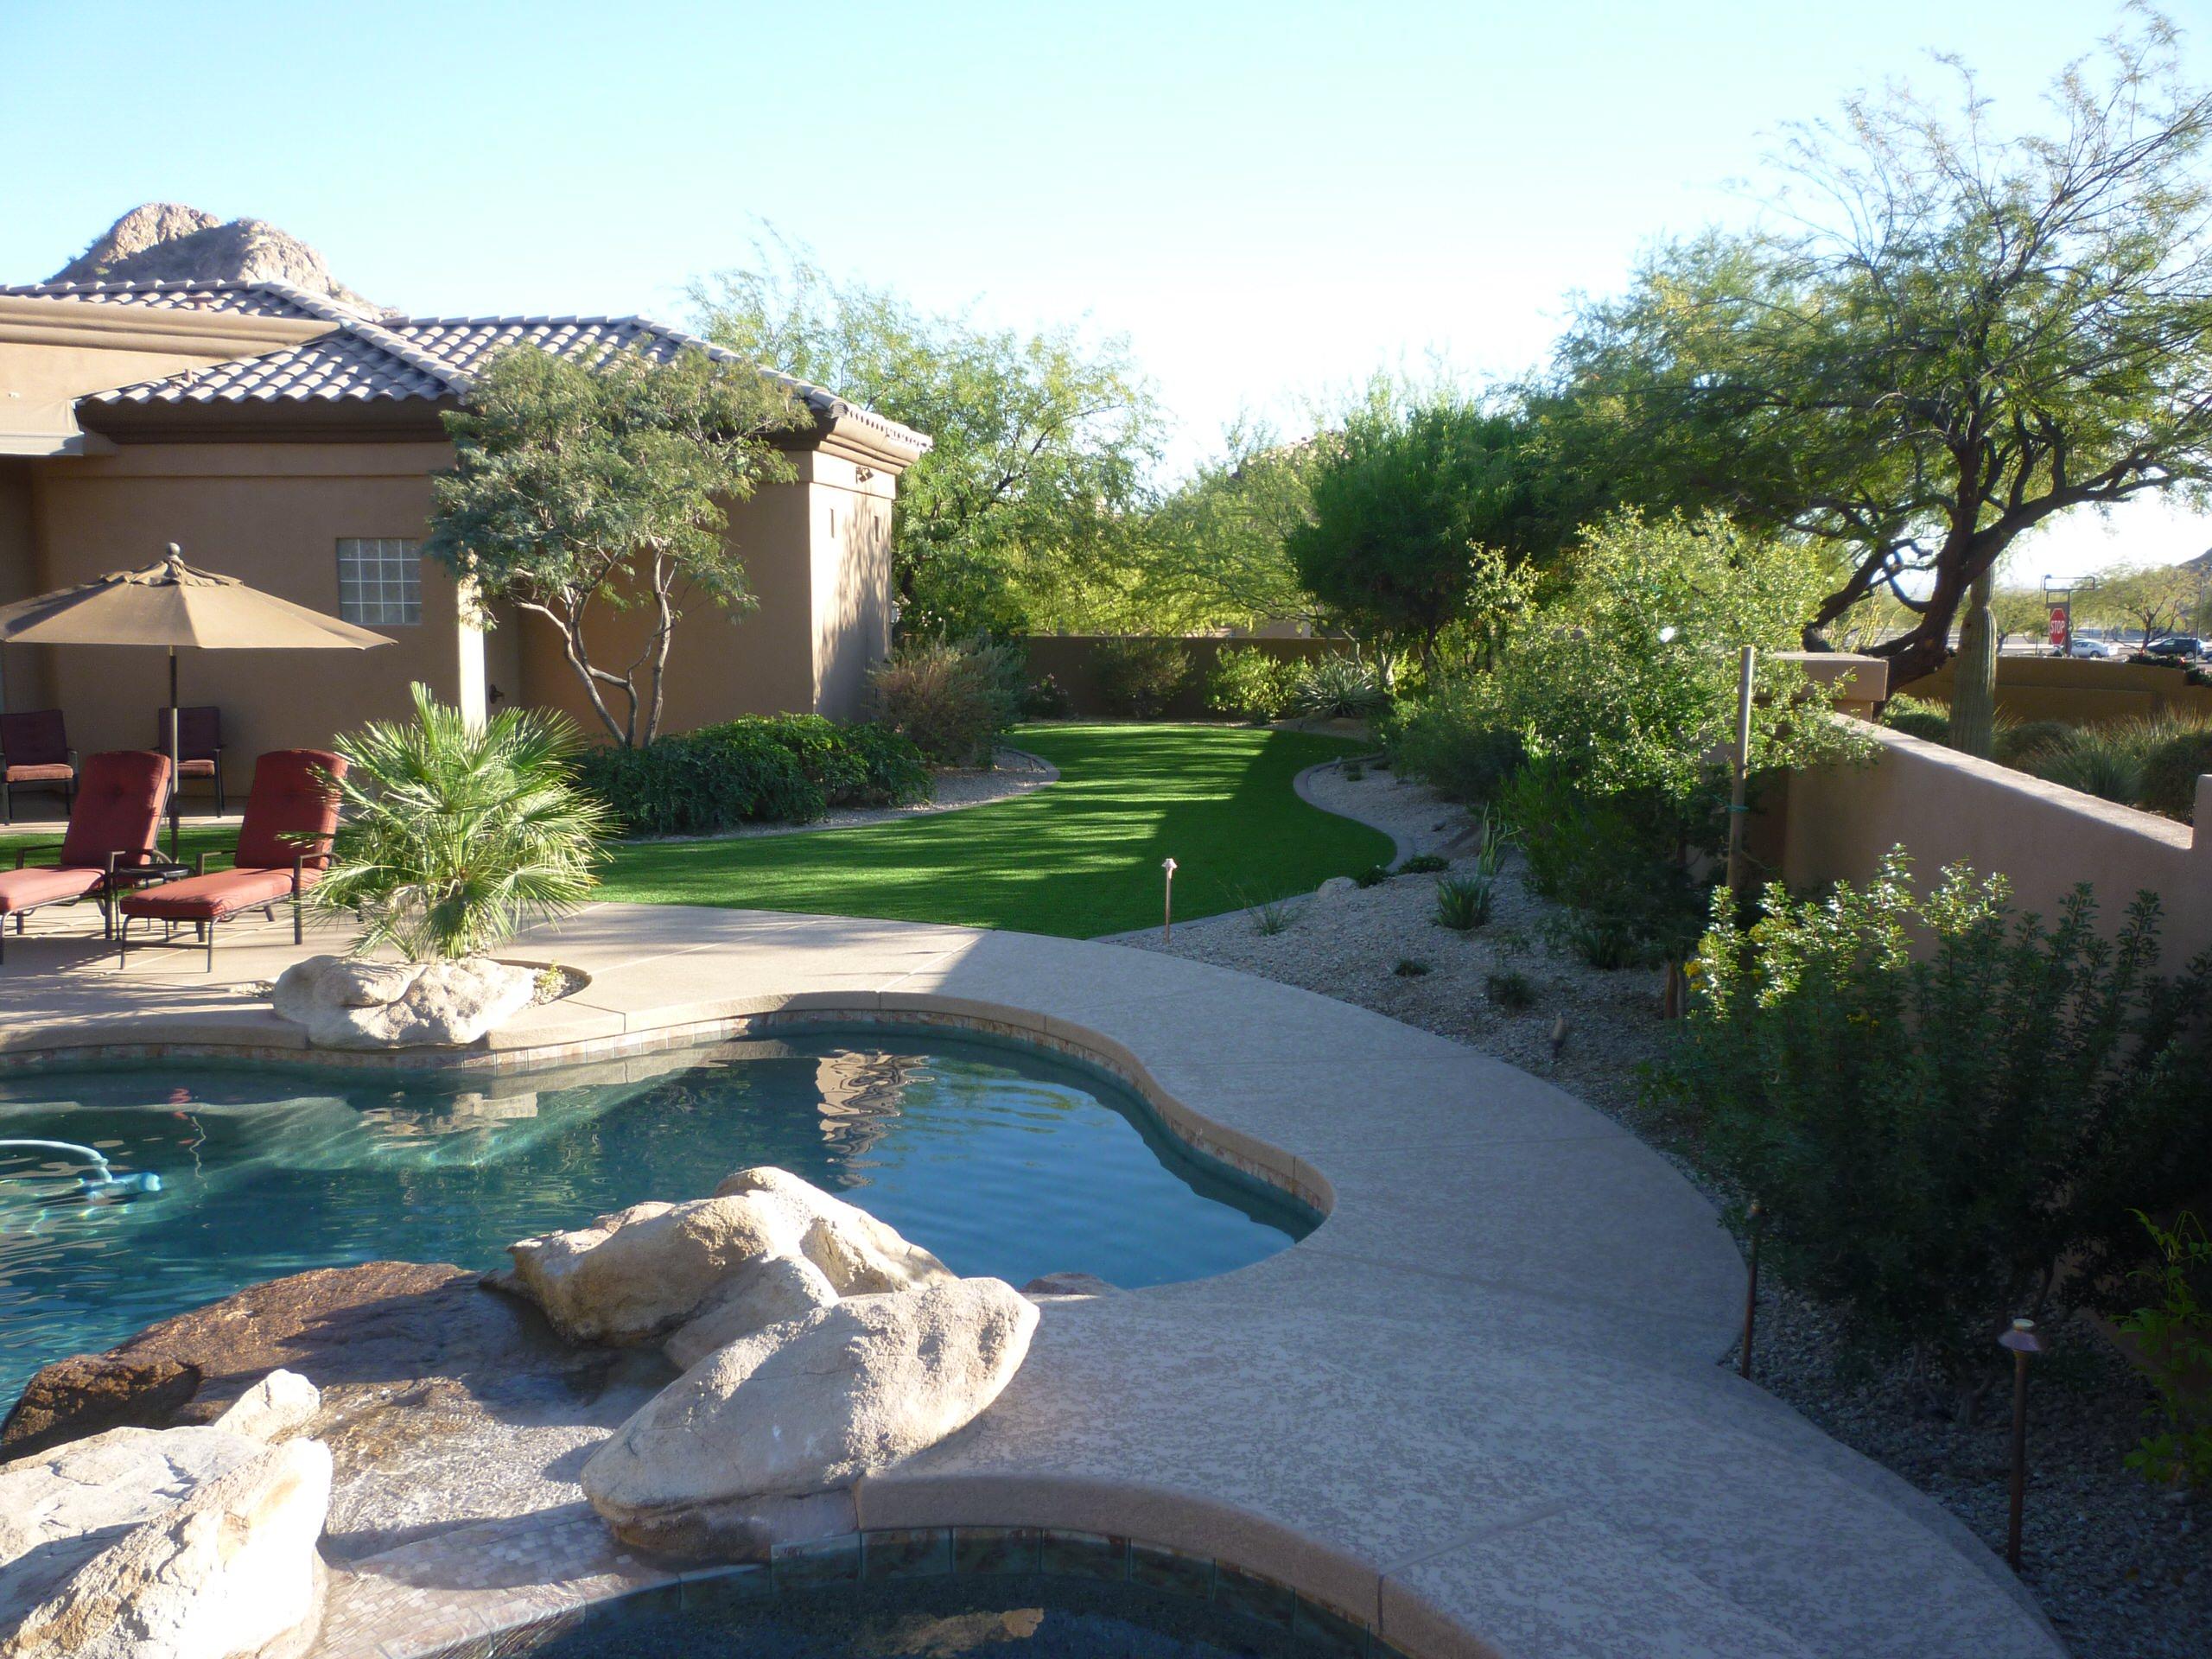 Pool Area w/ Artificial Turf